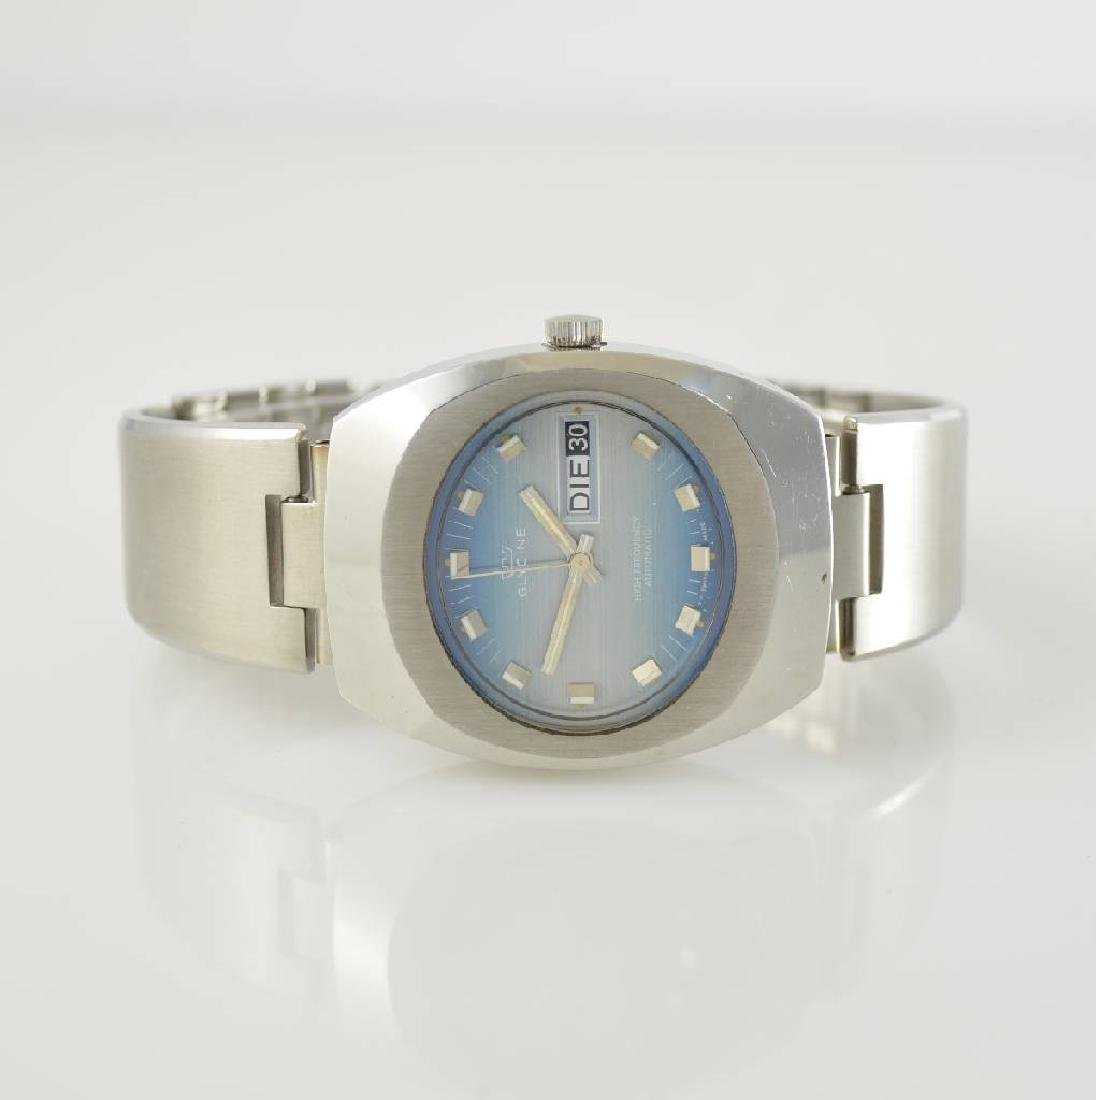 GLYCINE High Frequency gents wristwatch